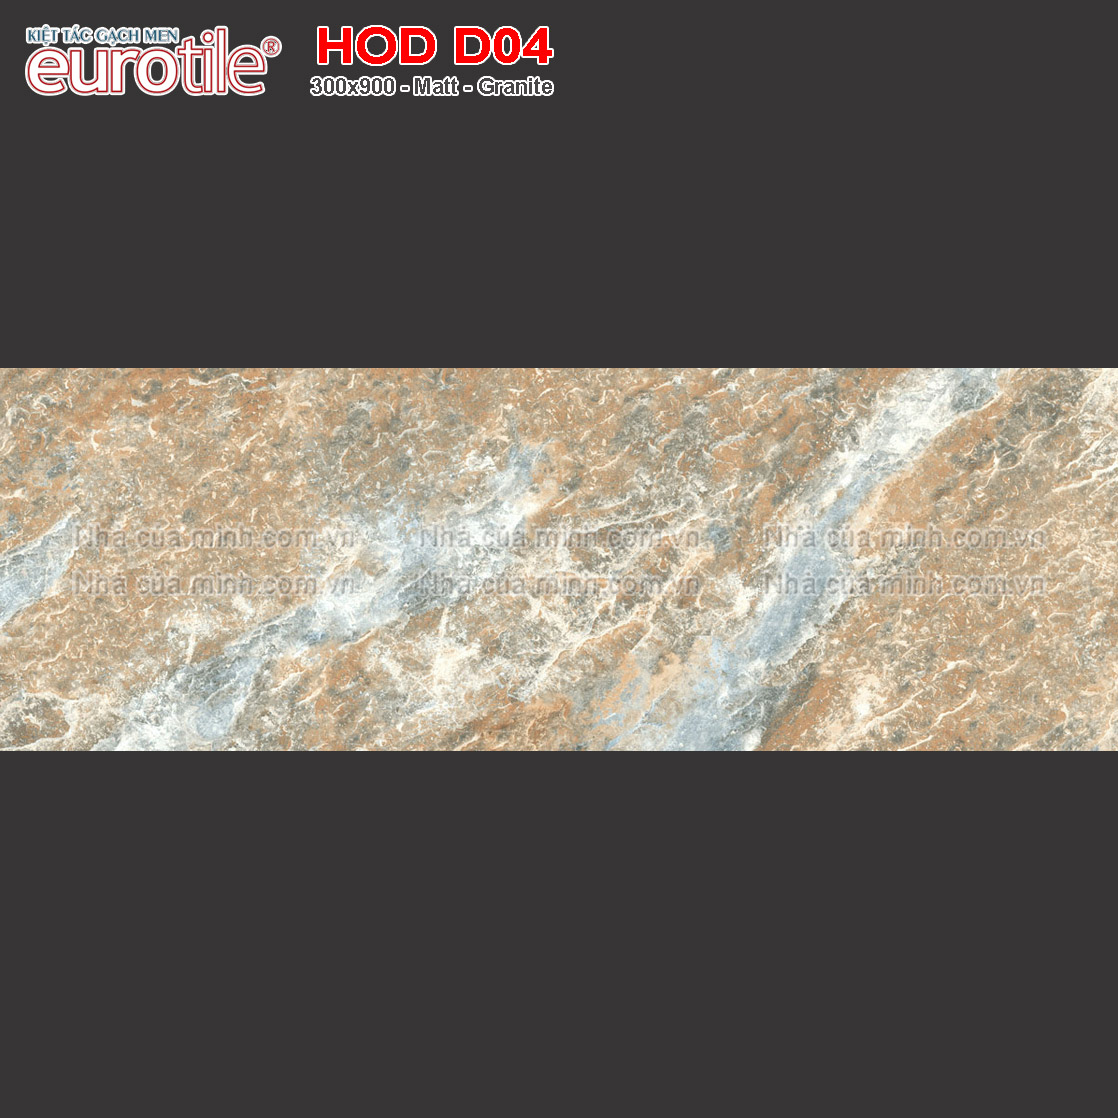 Gạch ốp lát 300x900 Eurotile Hoa Đá HOD D04 giá rẻ